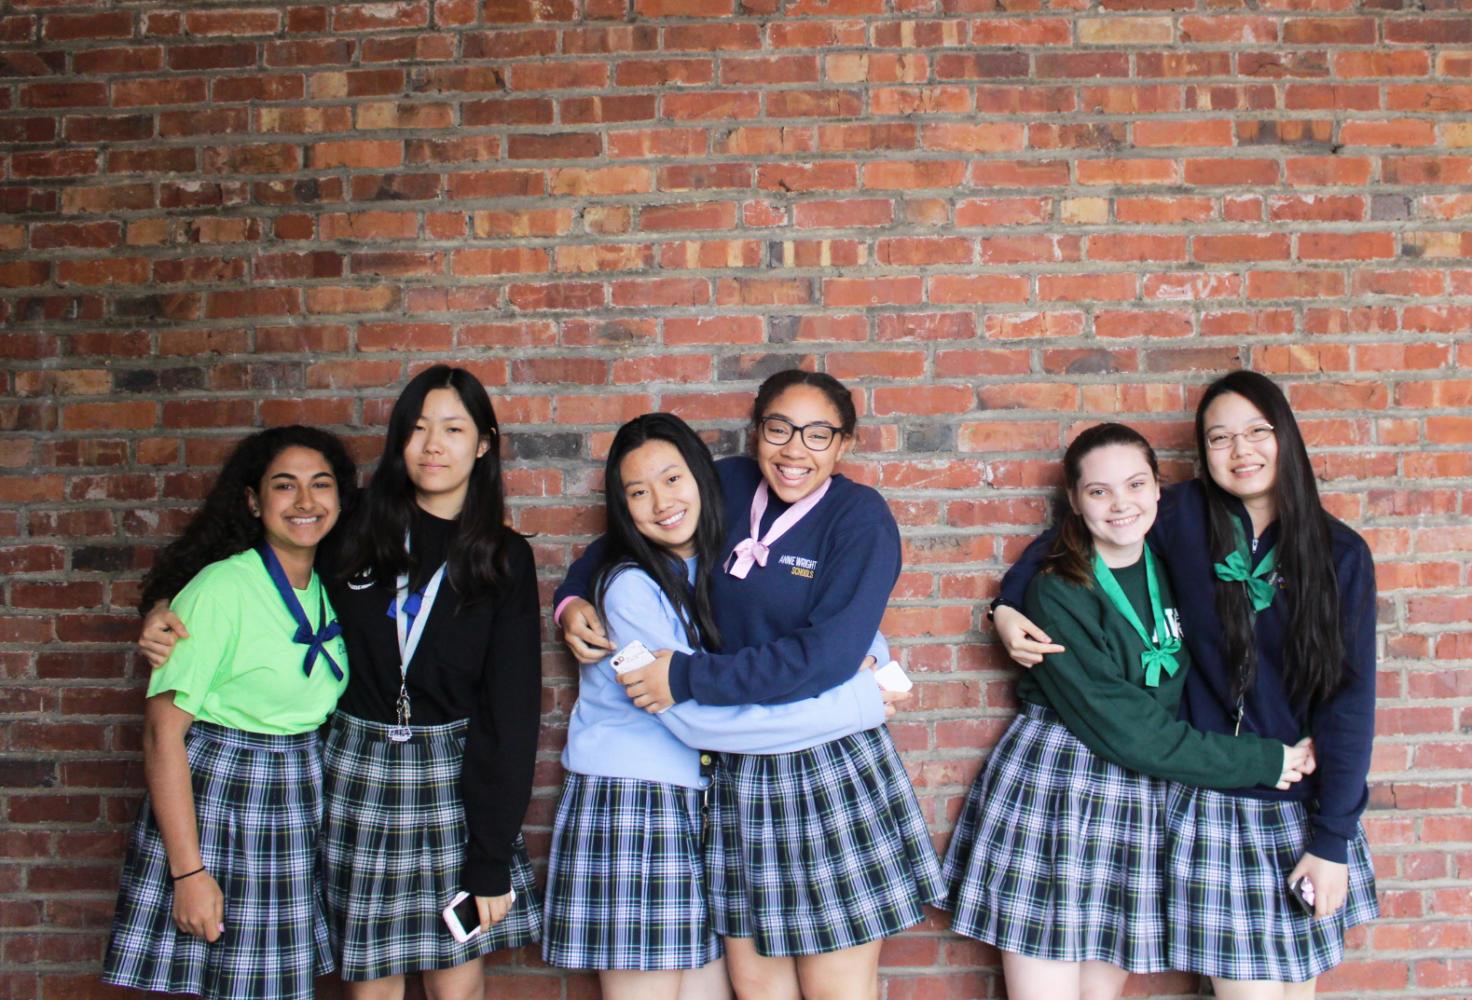 from left to right: Sitara McMillan, Tiffany Wang, Jessy Li, Kayla Mathurin, Aiyana Honeysuckle and Minyi Jiang